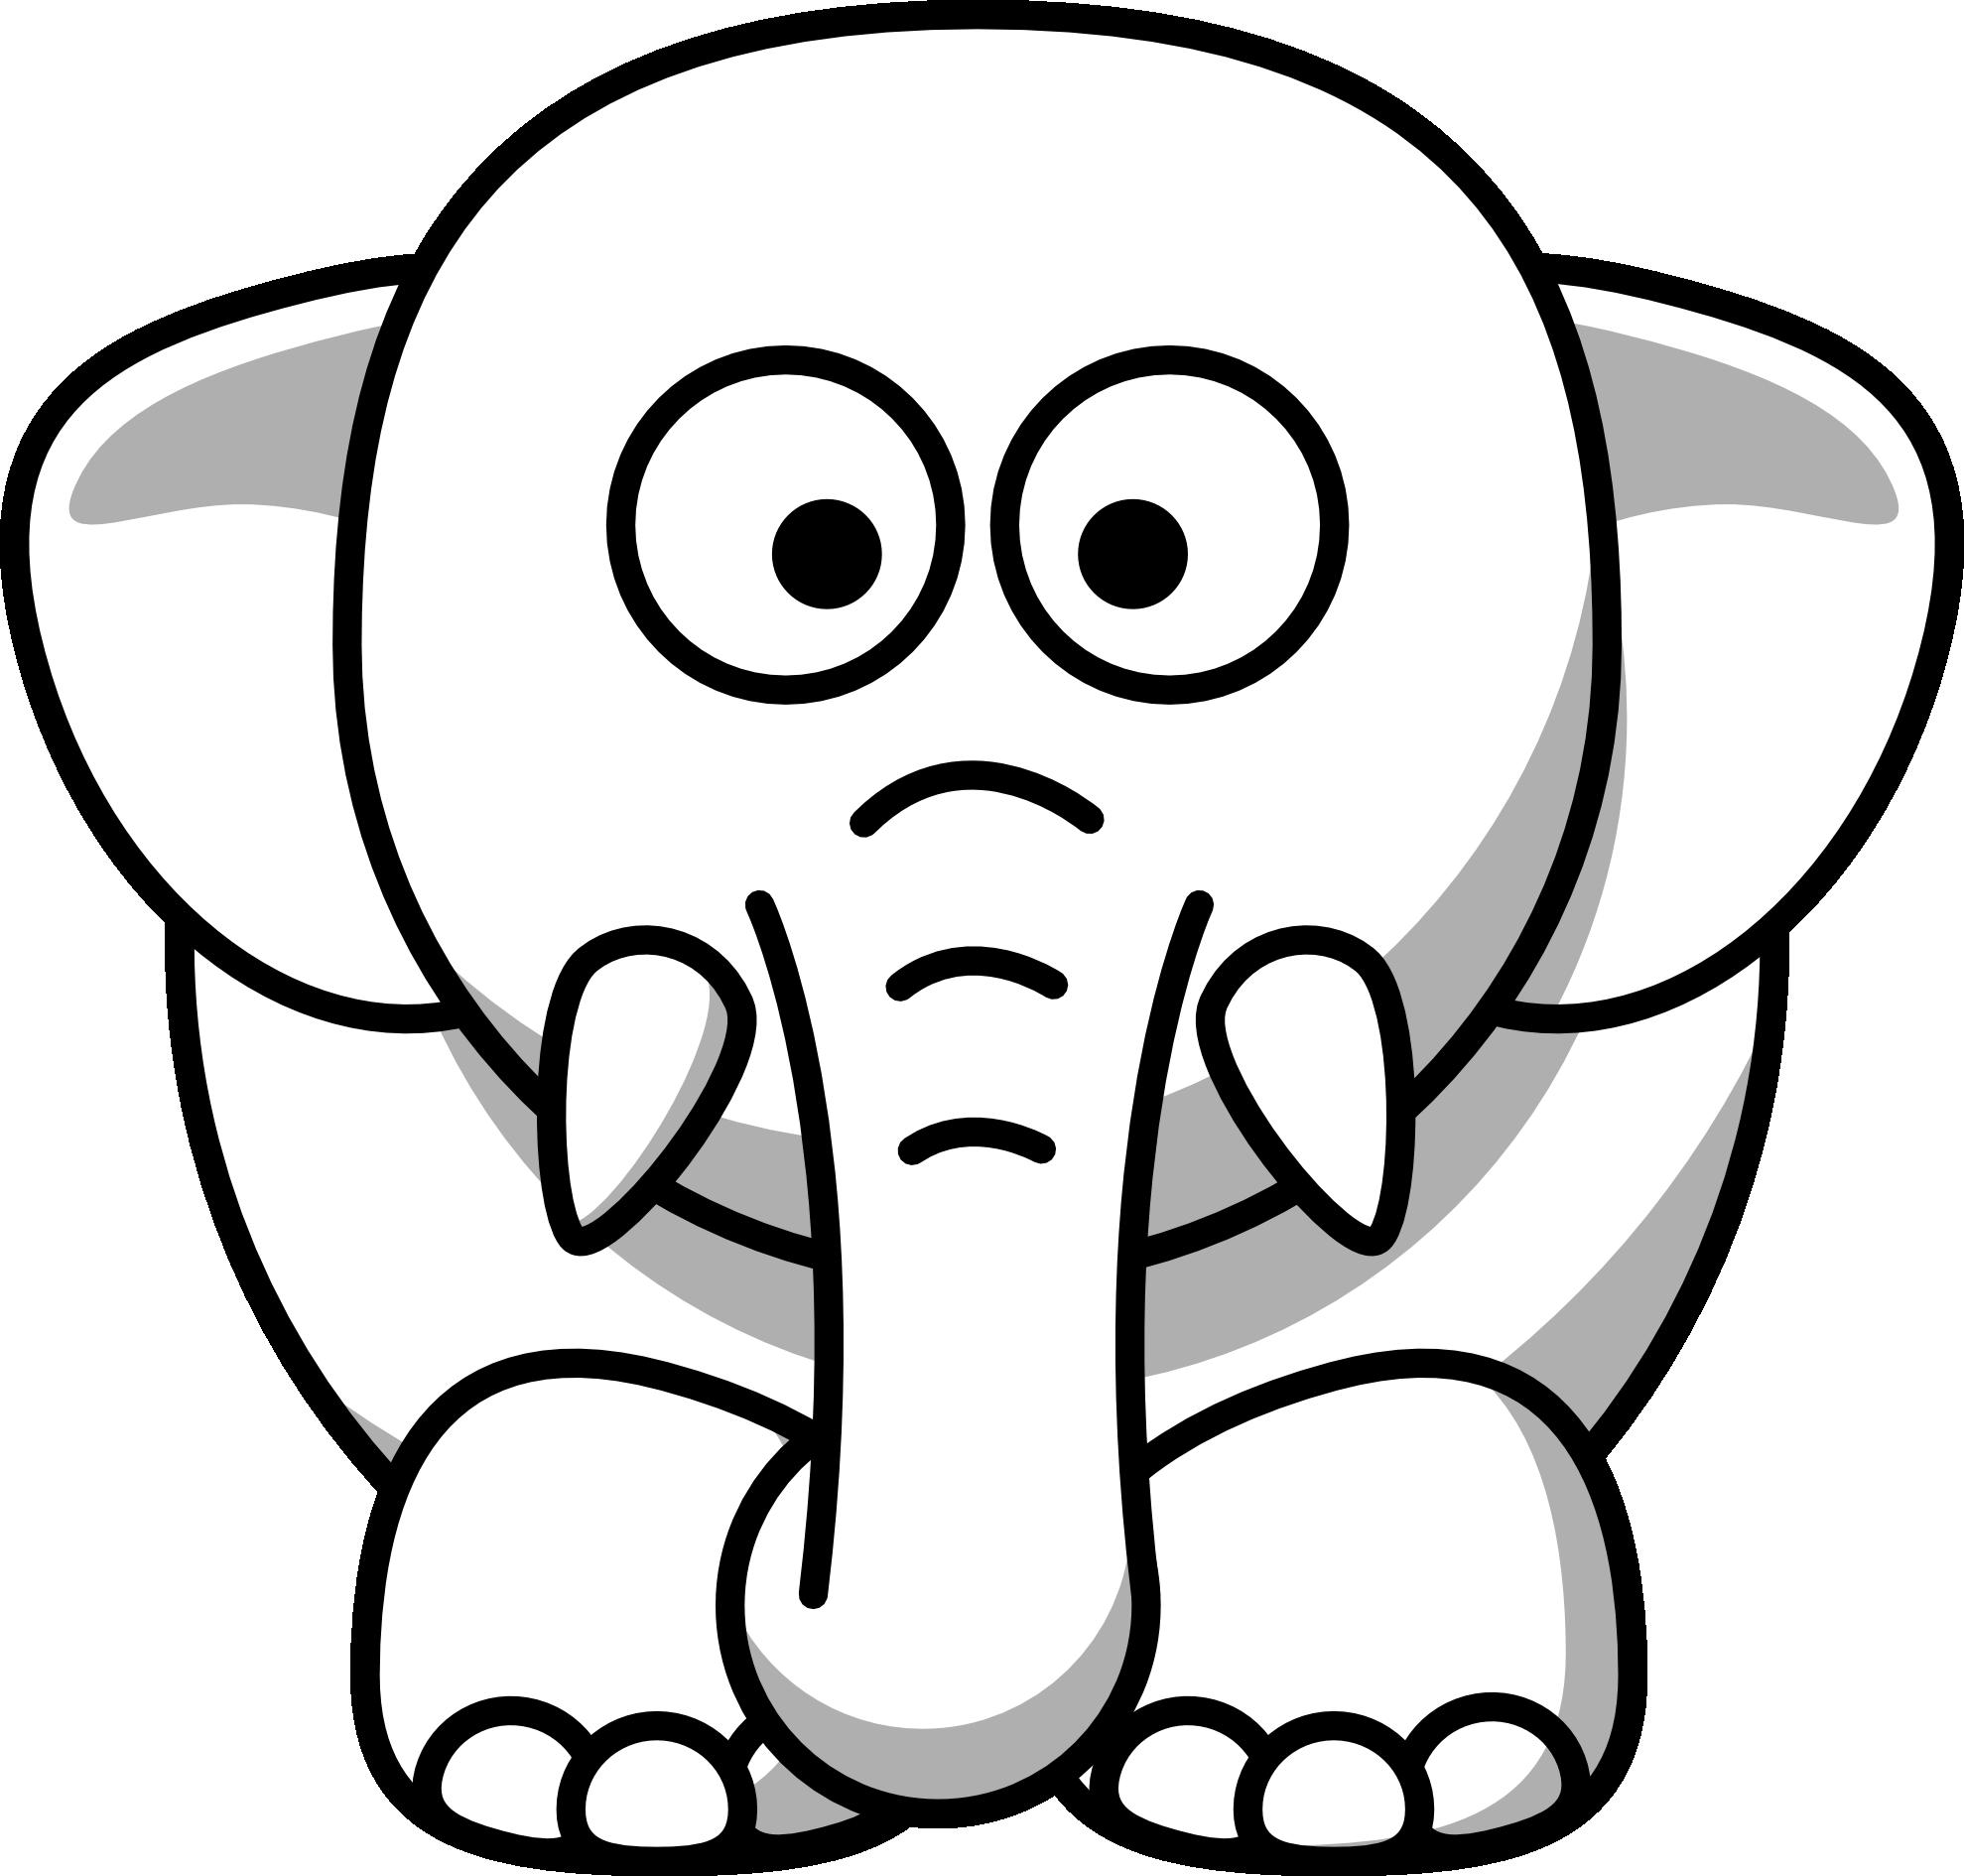 Elephant Clip Art Birthday | Clipart Lib-Elephant Clip Art Birthday | Clipart library - Free Clipart Images-7